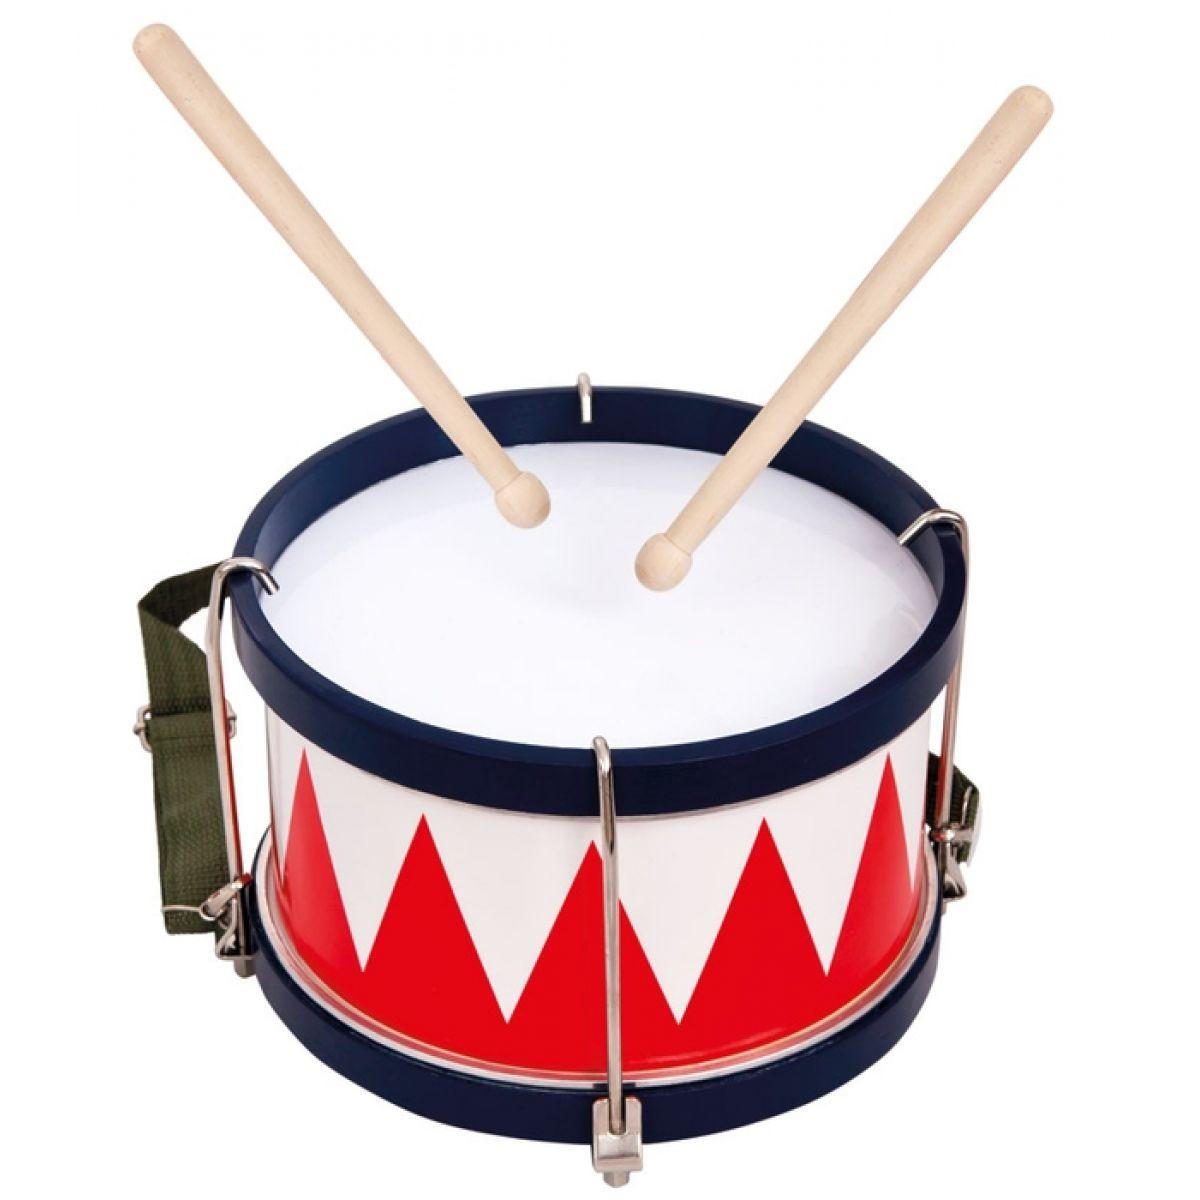 Картинка барабана с палочками